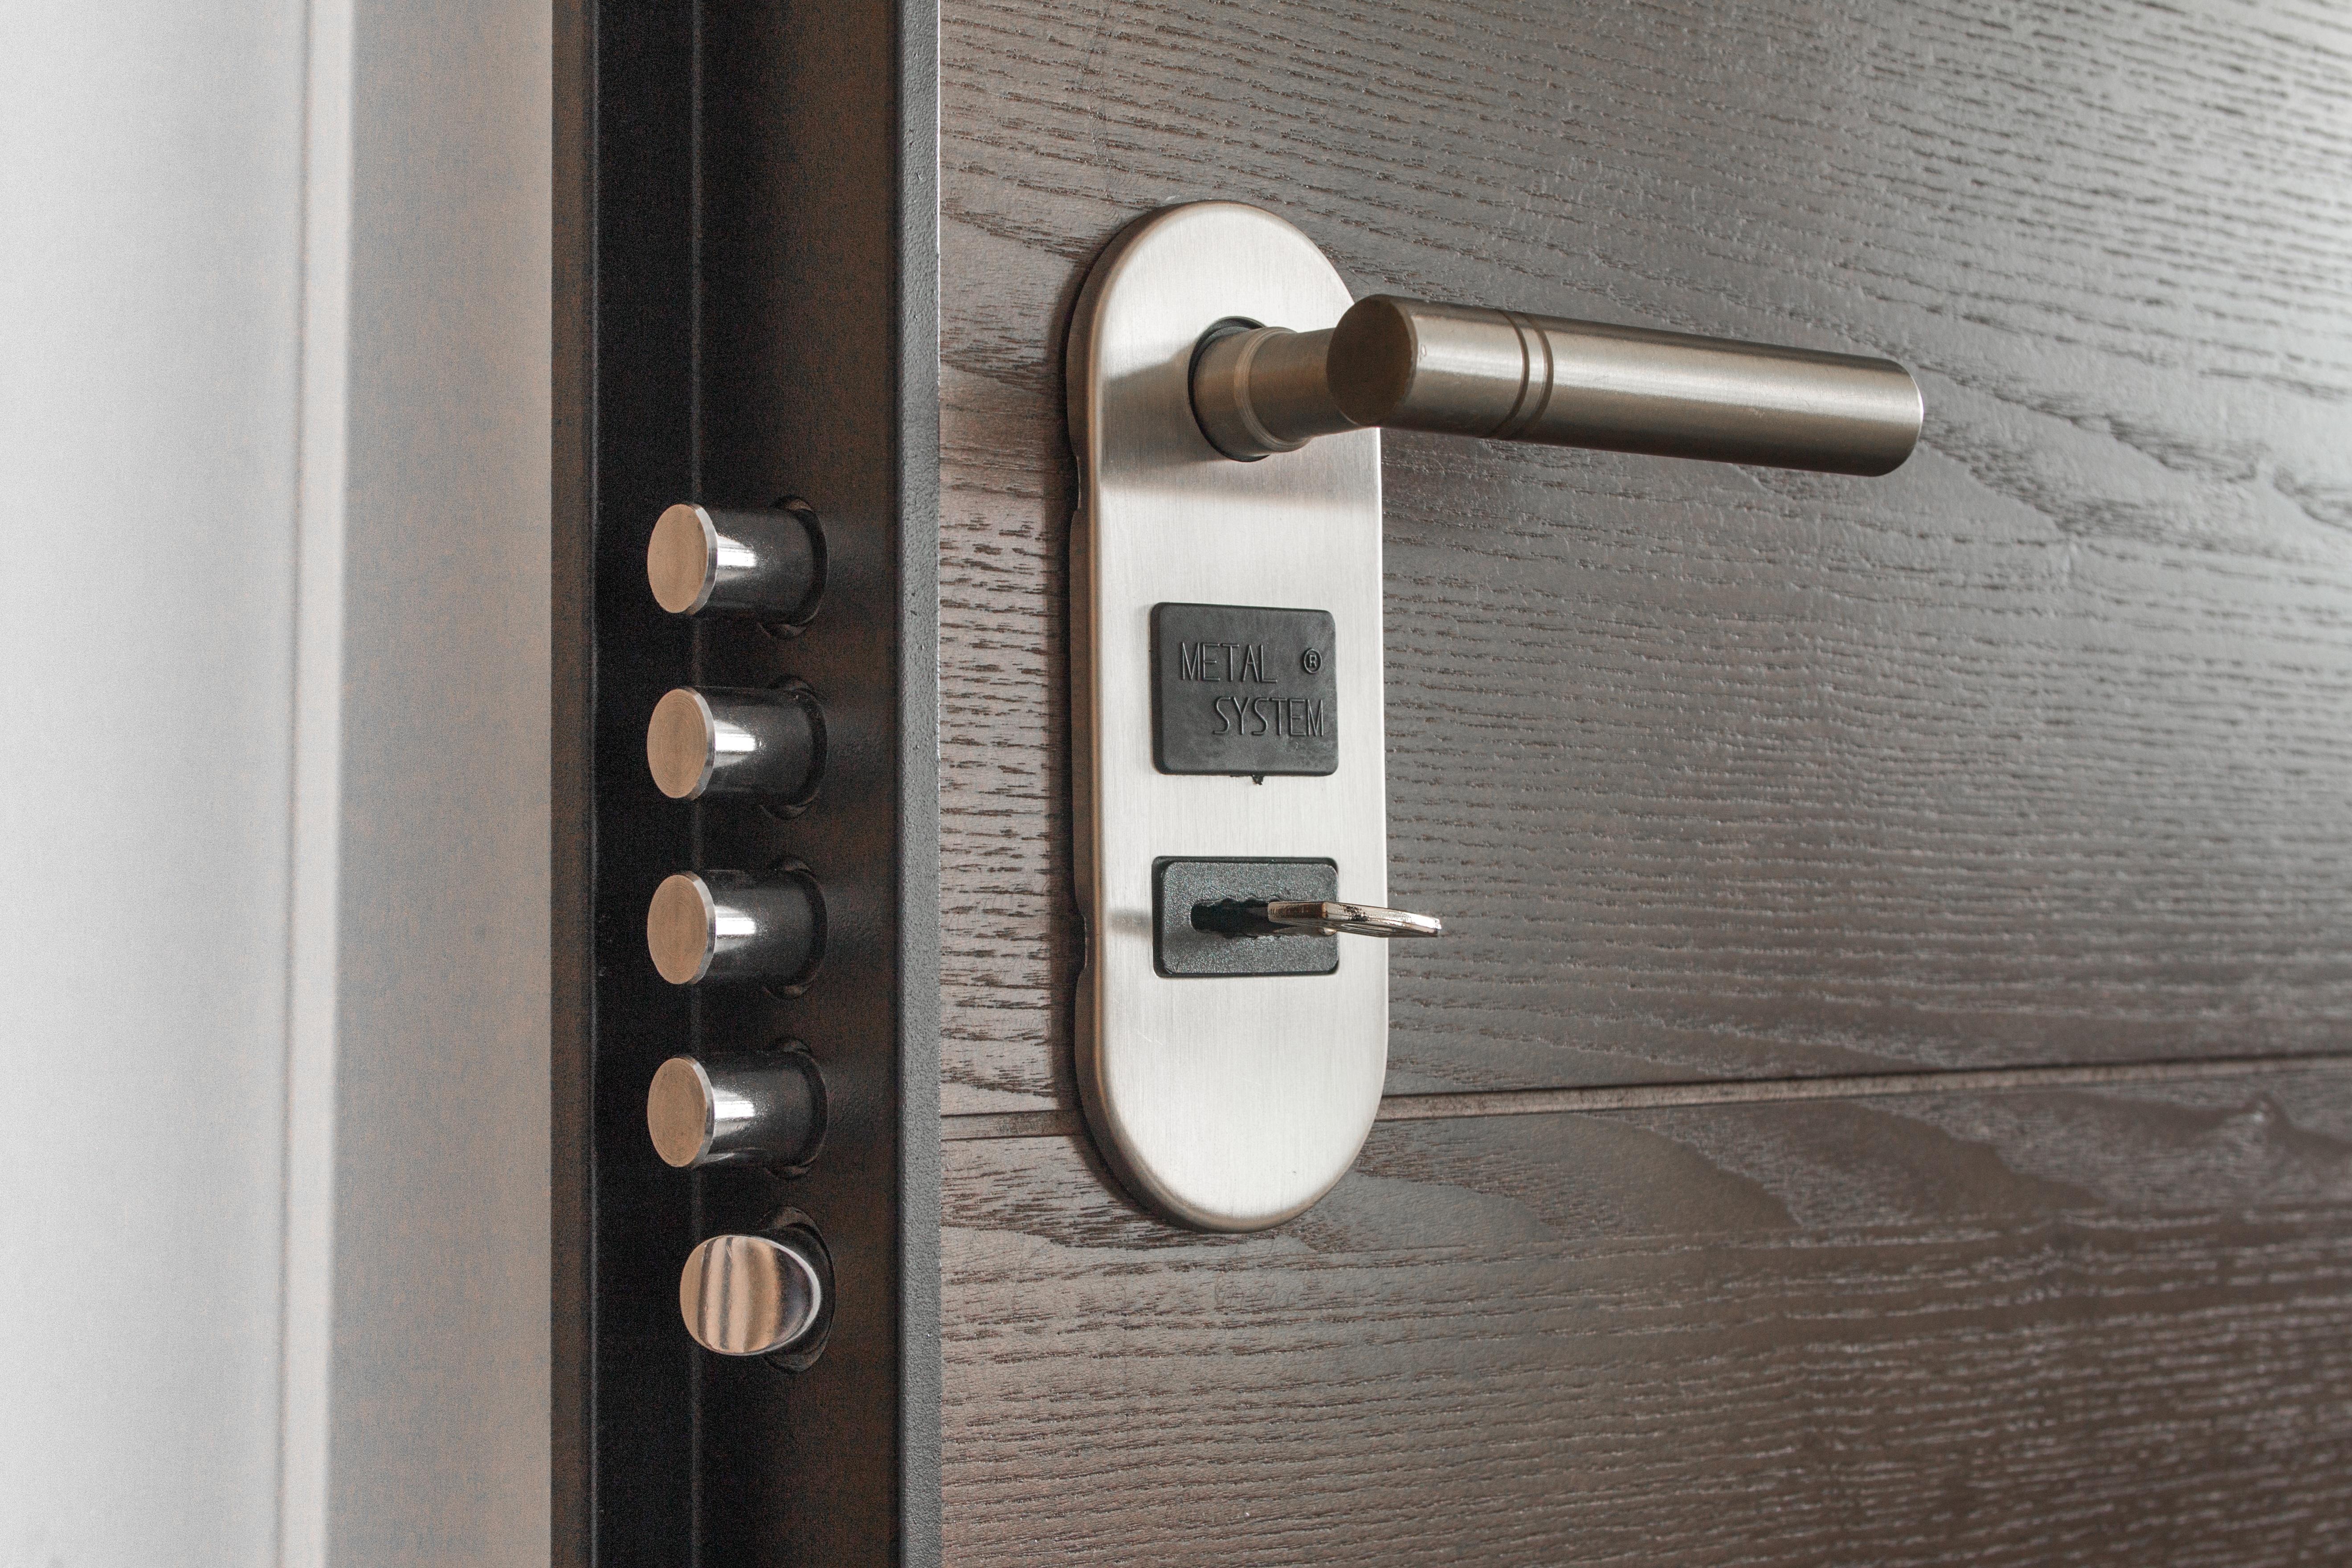 Installation of new locks on your doors